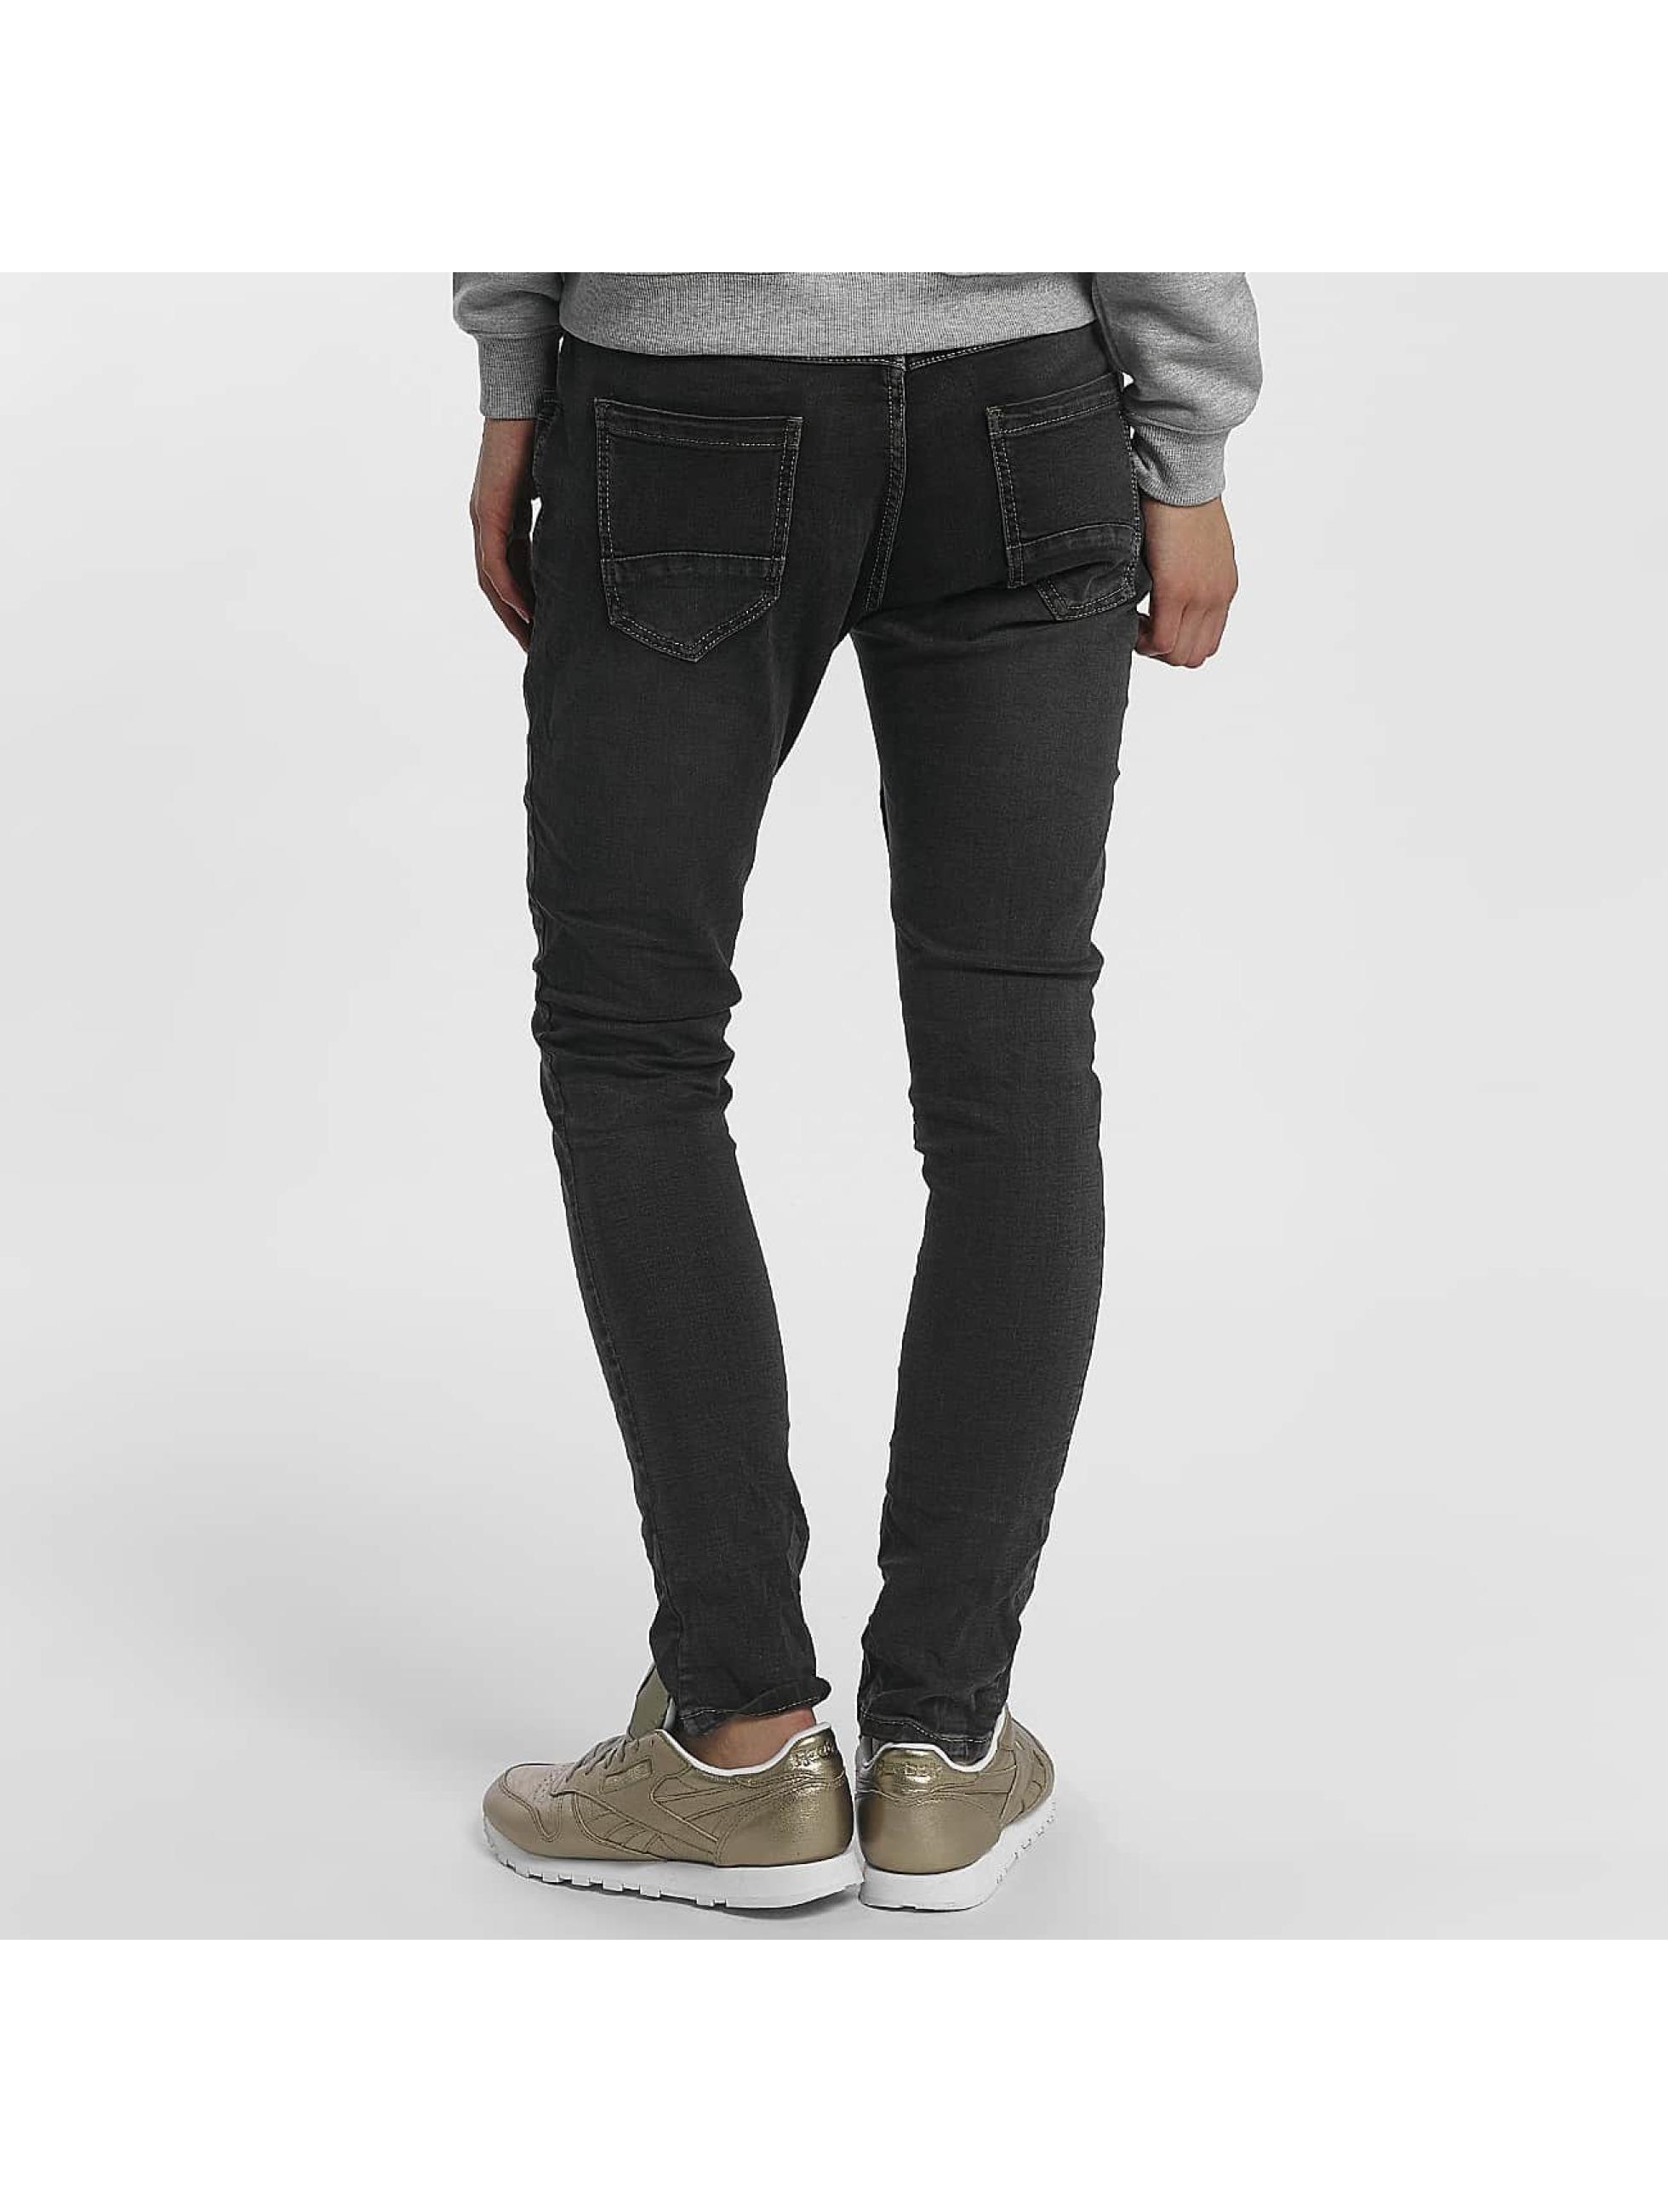 Leg Kings Skinny Jeans Paul gray